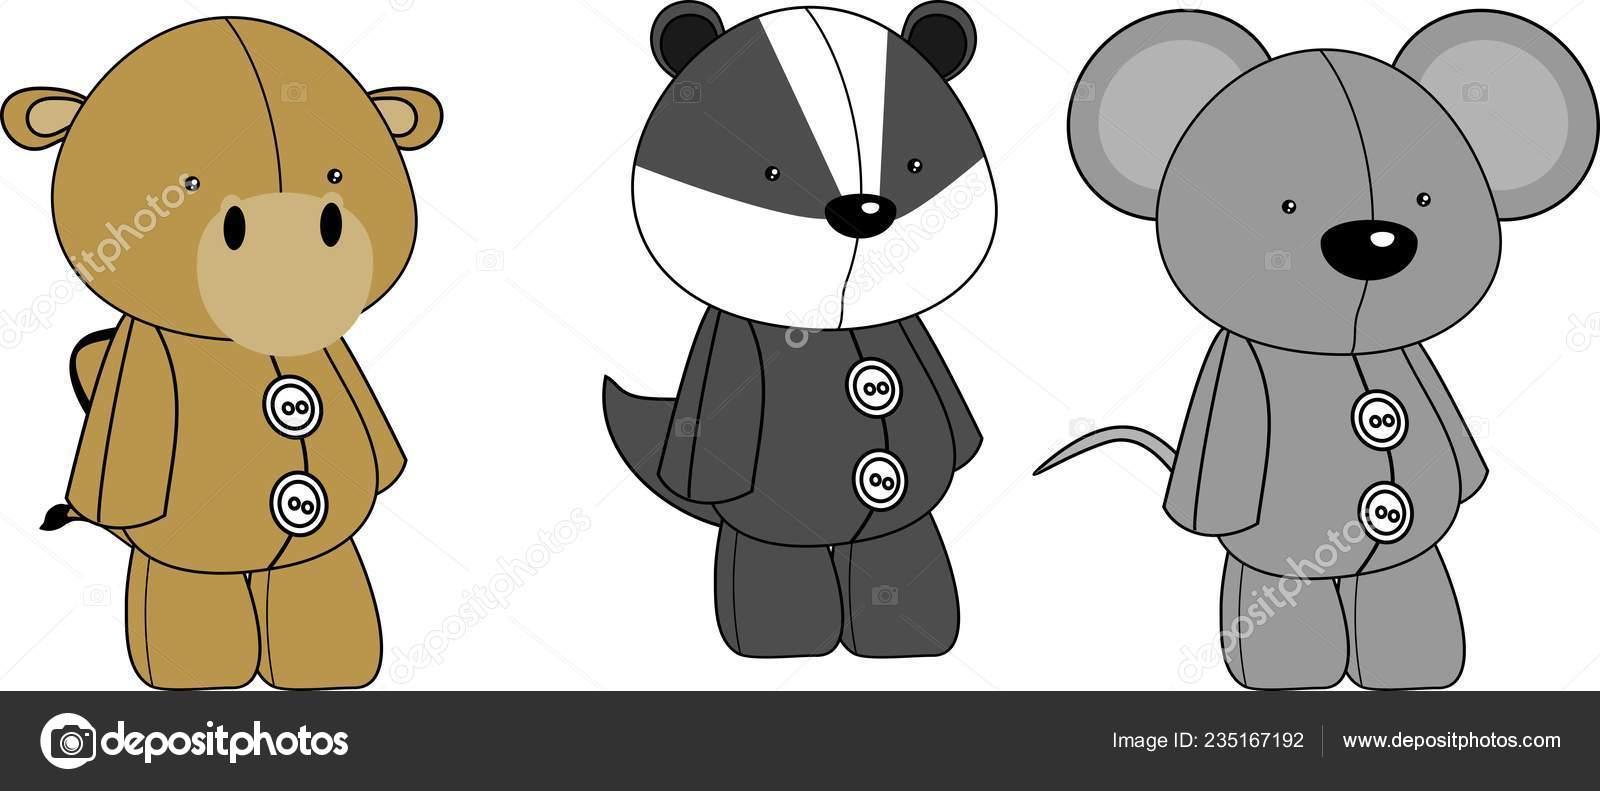 Image of: Cute Kawaii Kawaii Animals Plush Toy Cartoons Collection Set In Vector Format Very Easy To Edit Vector By Hayashix23 Amazoncom Kawaii Animals Plush Toy Cartoons Collection Set Vector Format Very